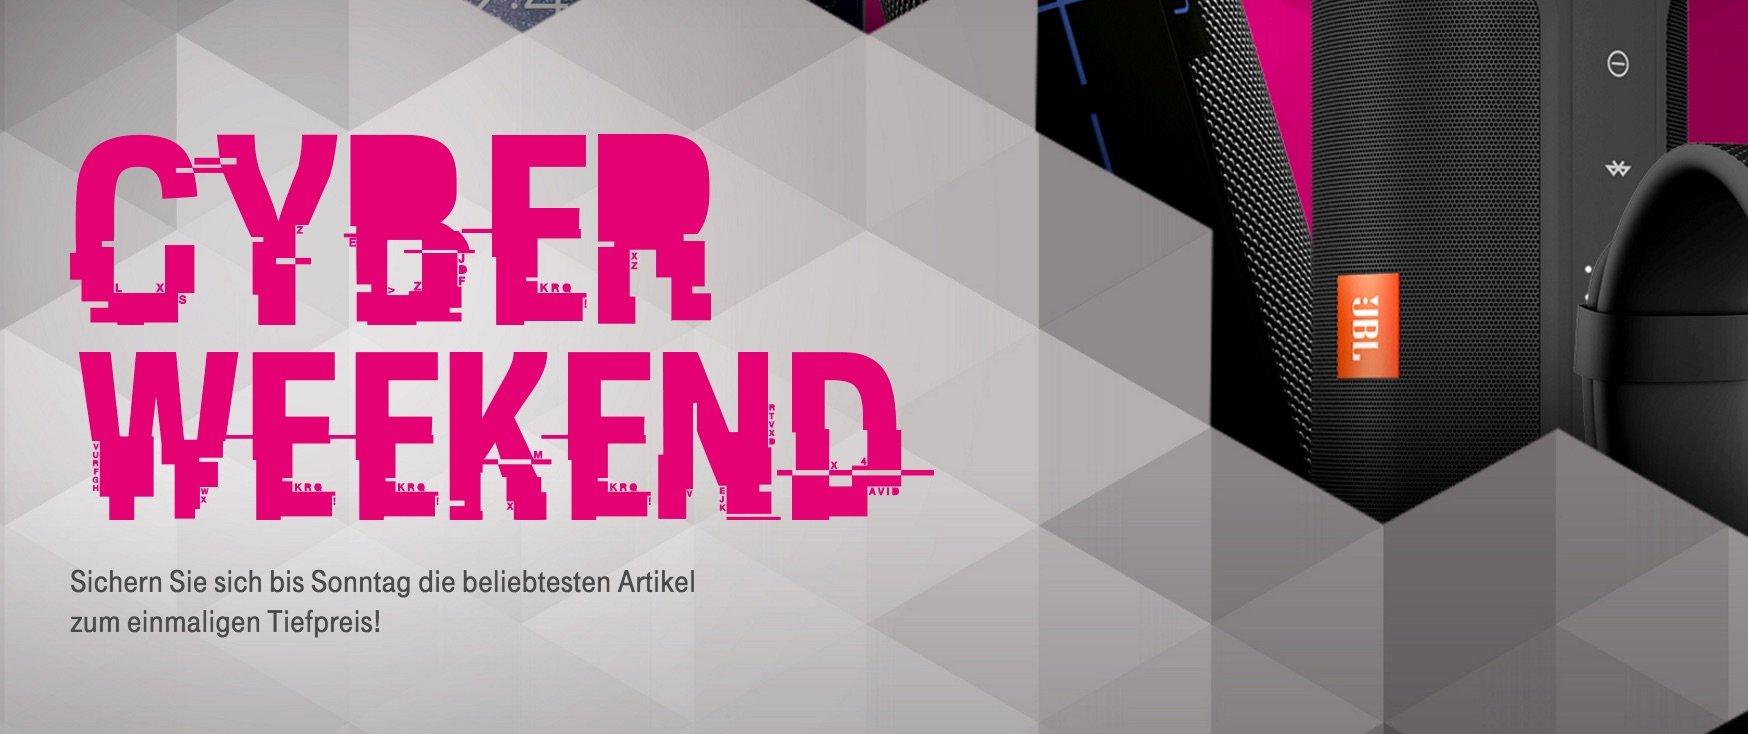 Aktuelle Telekom Aktionen: Cyber Weekend & Wünsch Dir Was! 1